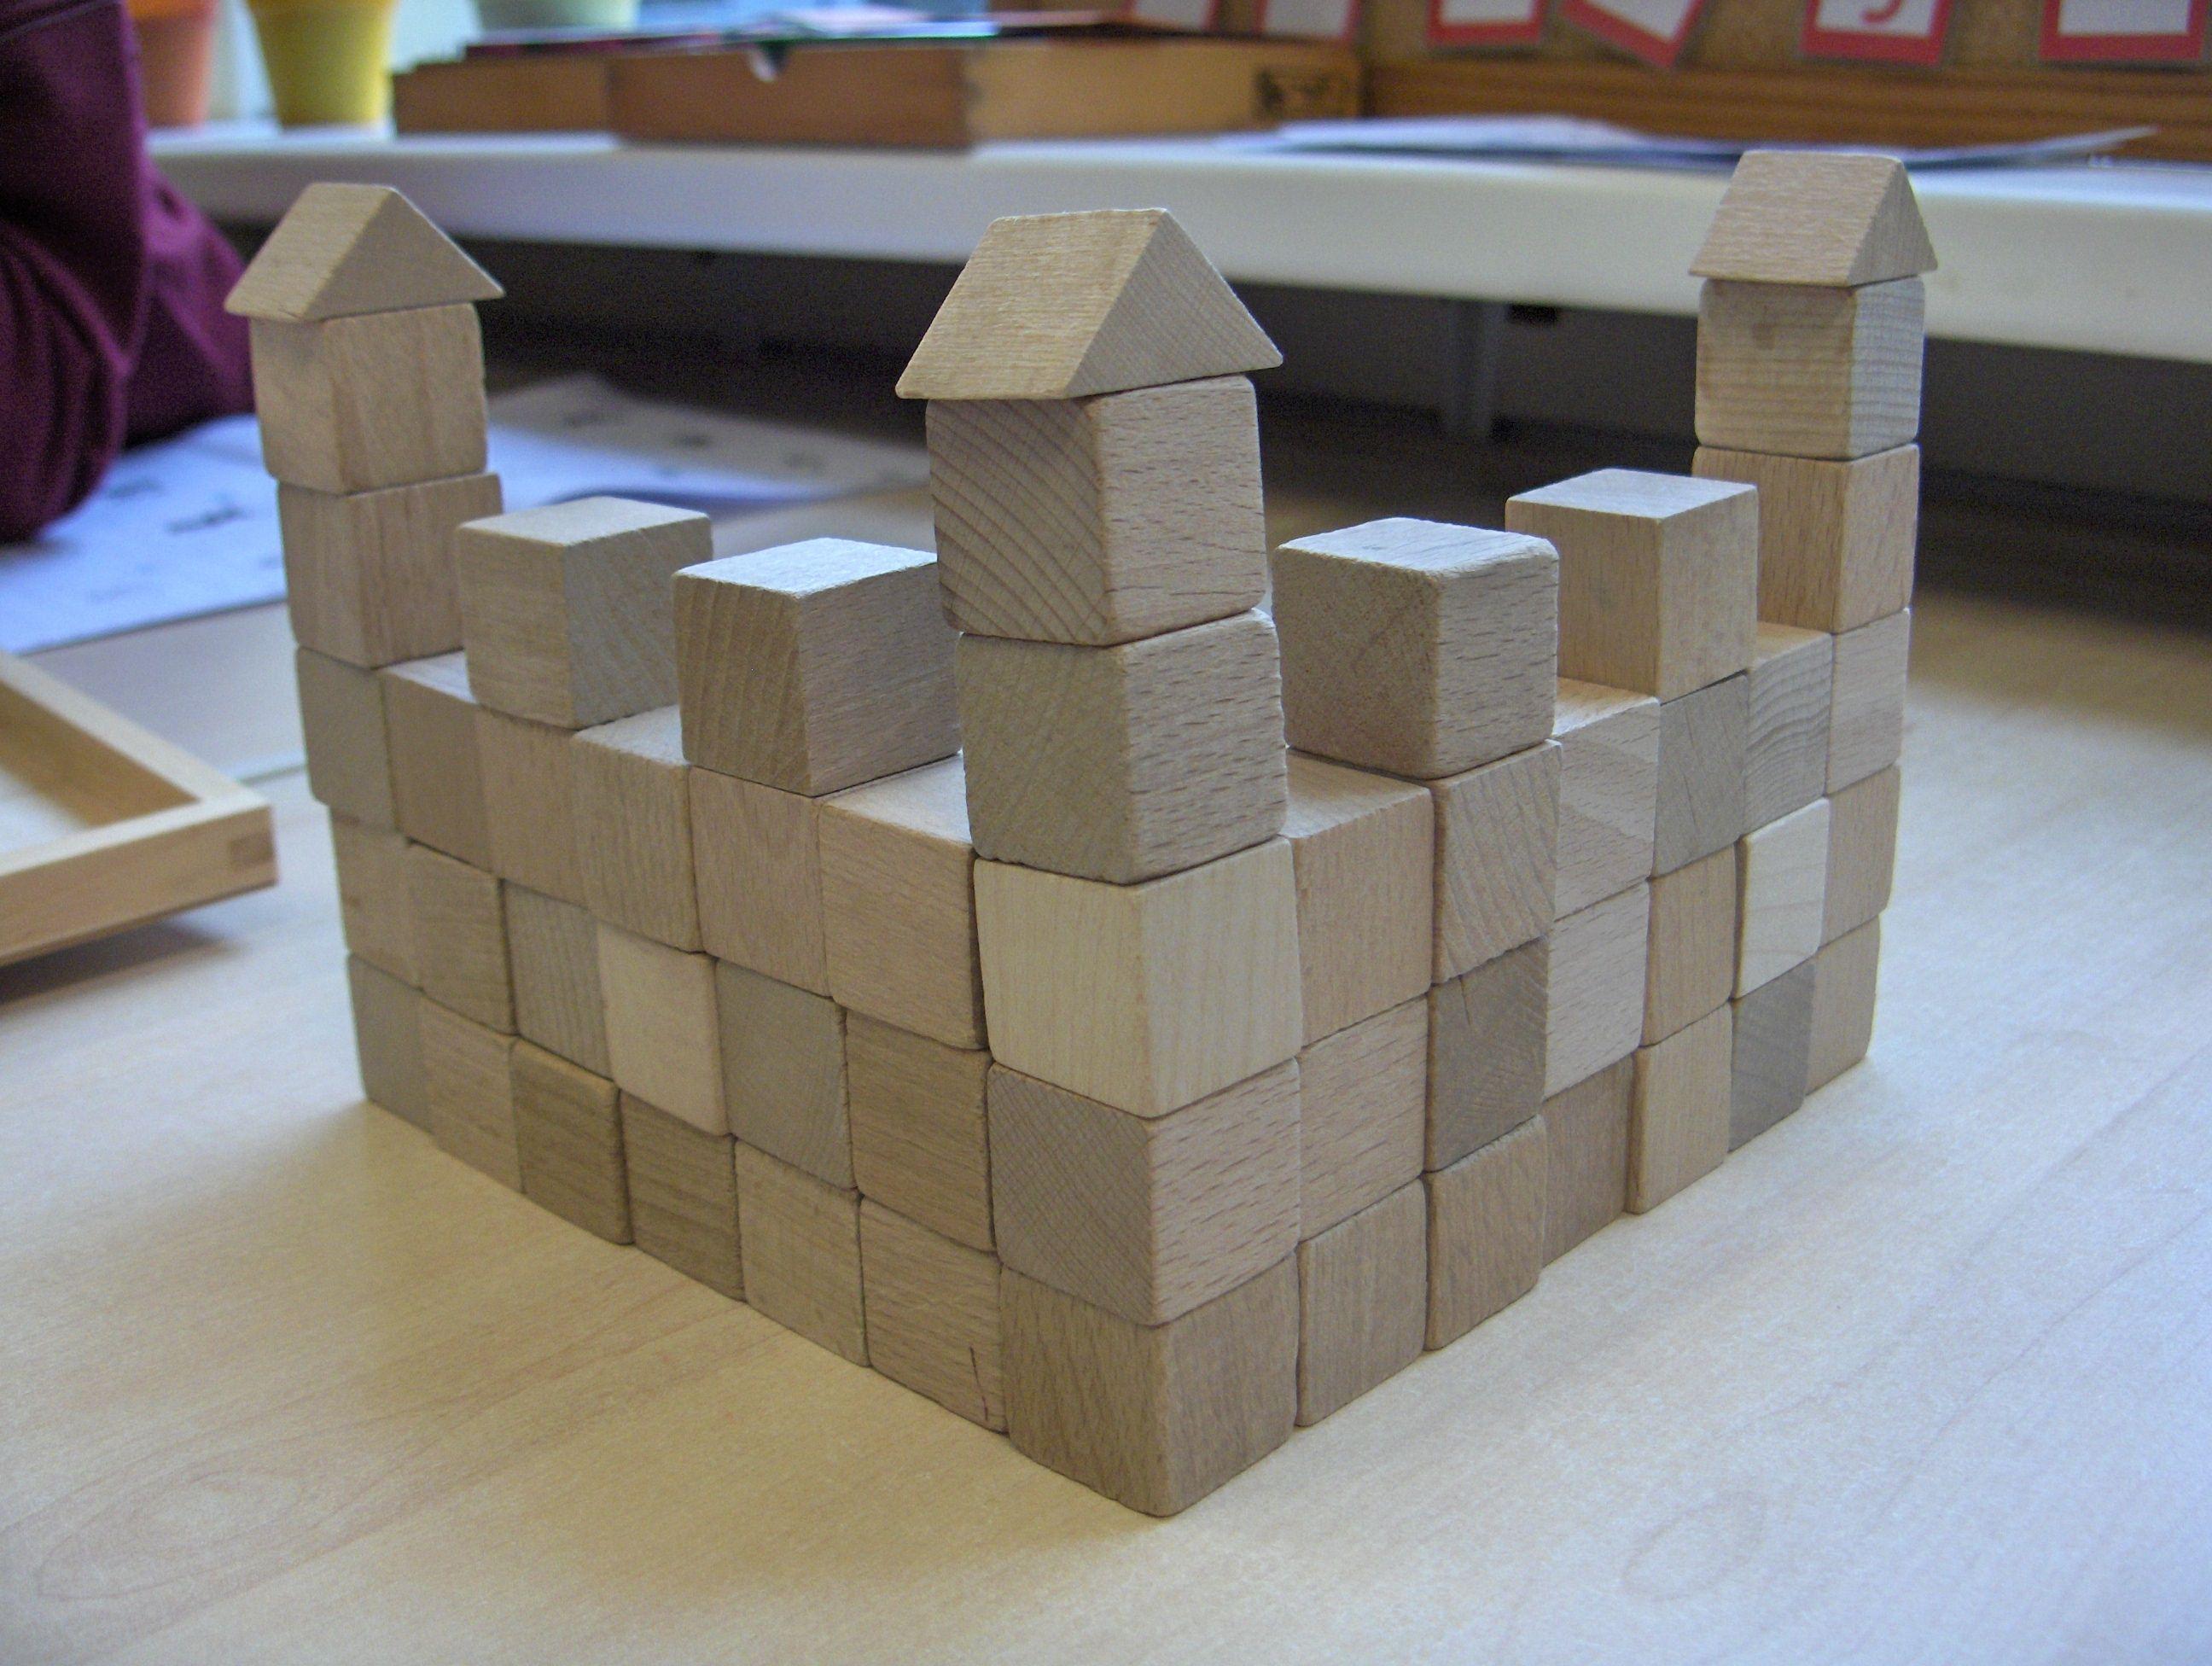 kasteel bouwen ridders kastelen thema